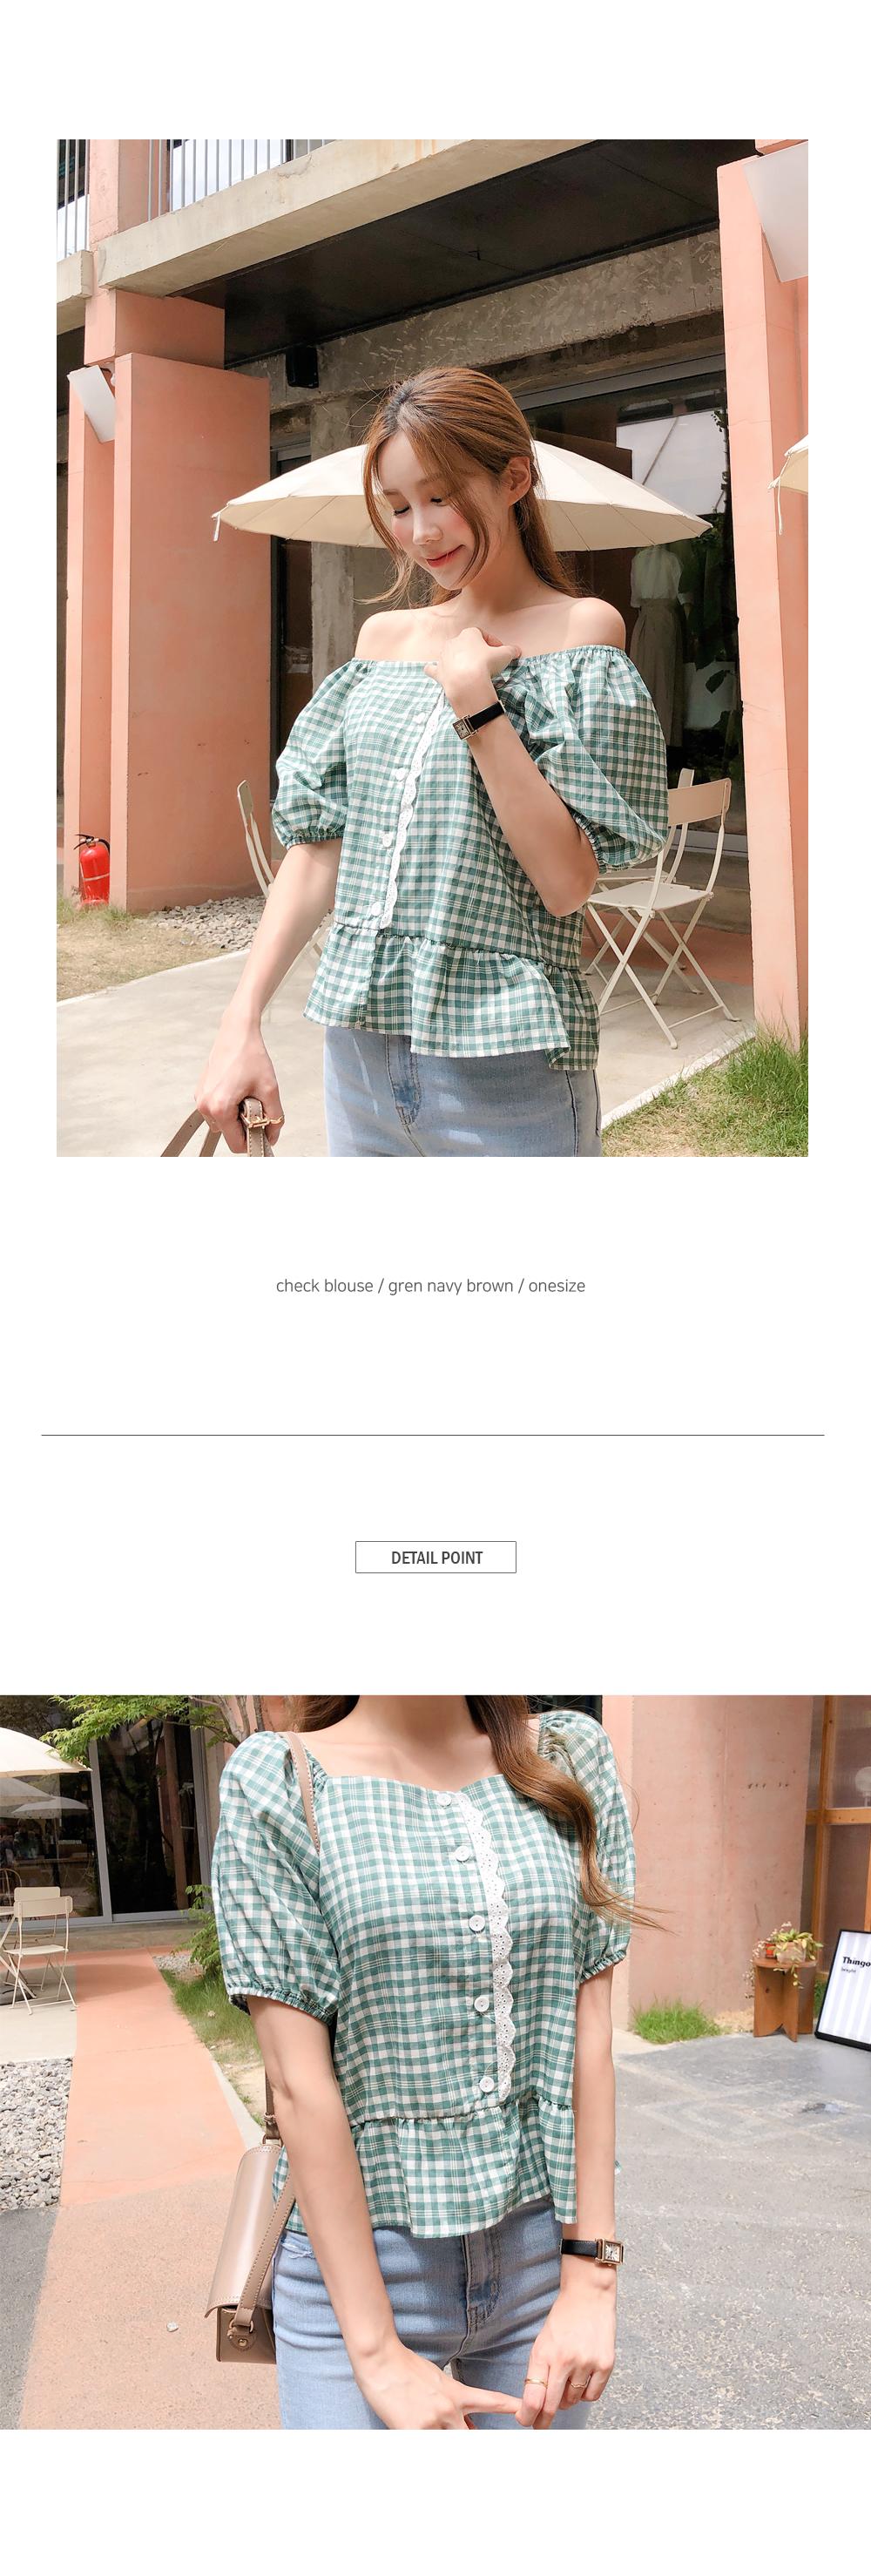 Lovely check-blouse